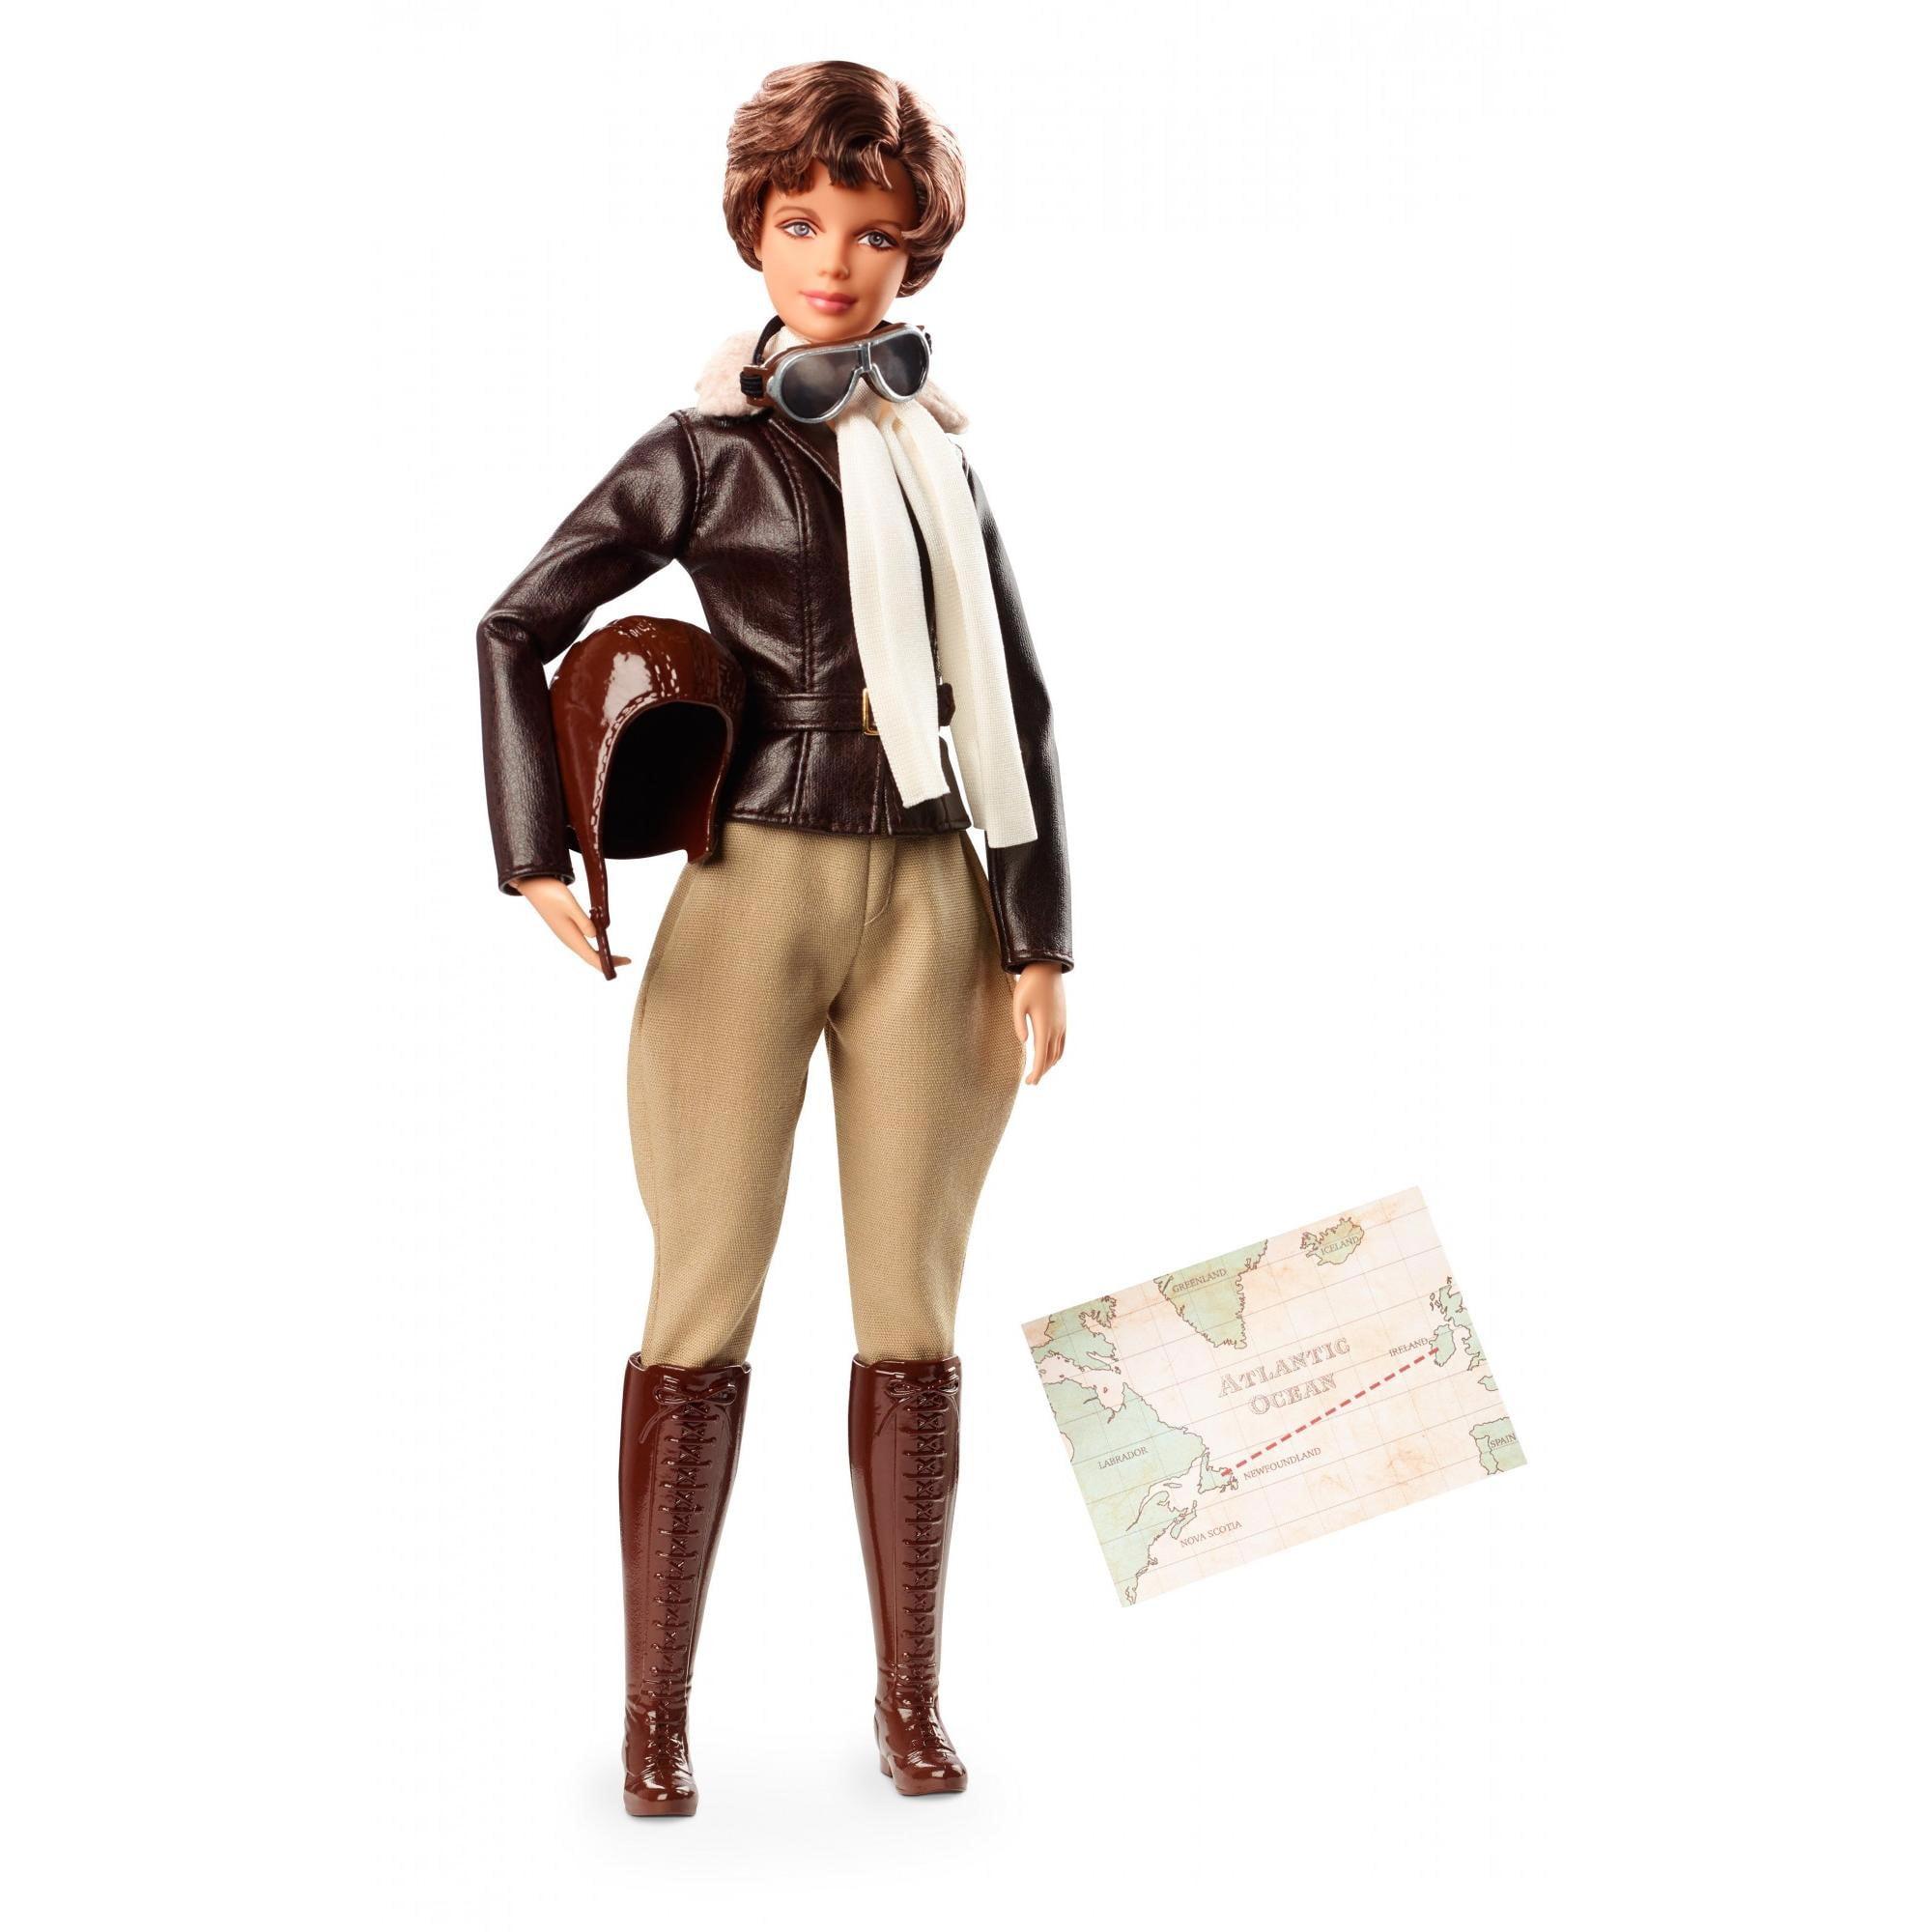 Barbie Inspiring Women Series Amelia Earhart Doll, Iconic Pilot's Look by Barbie